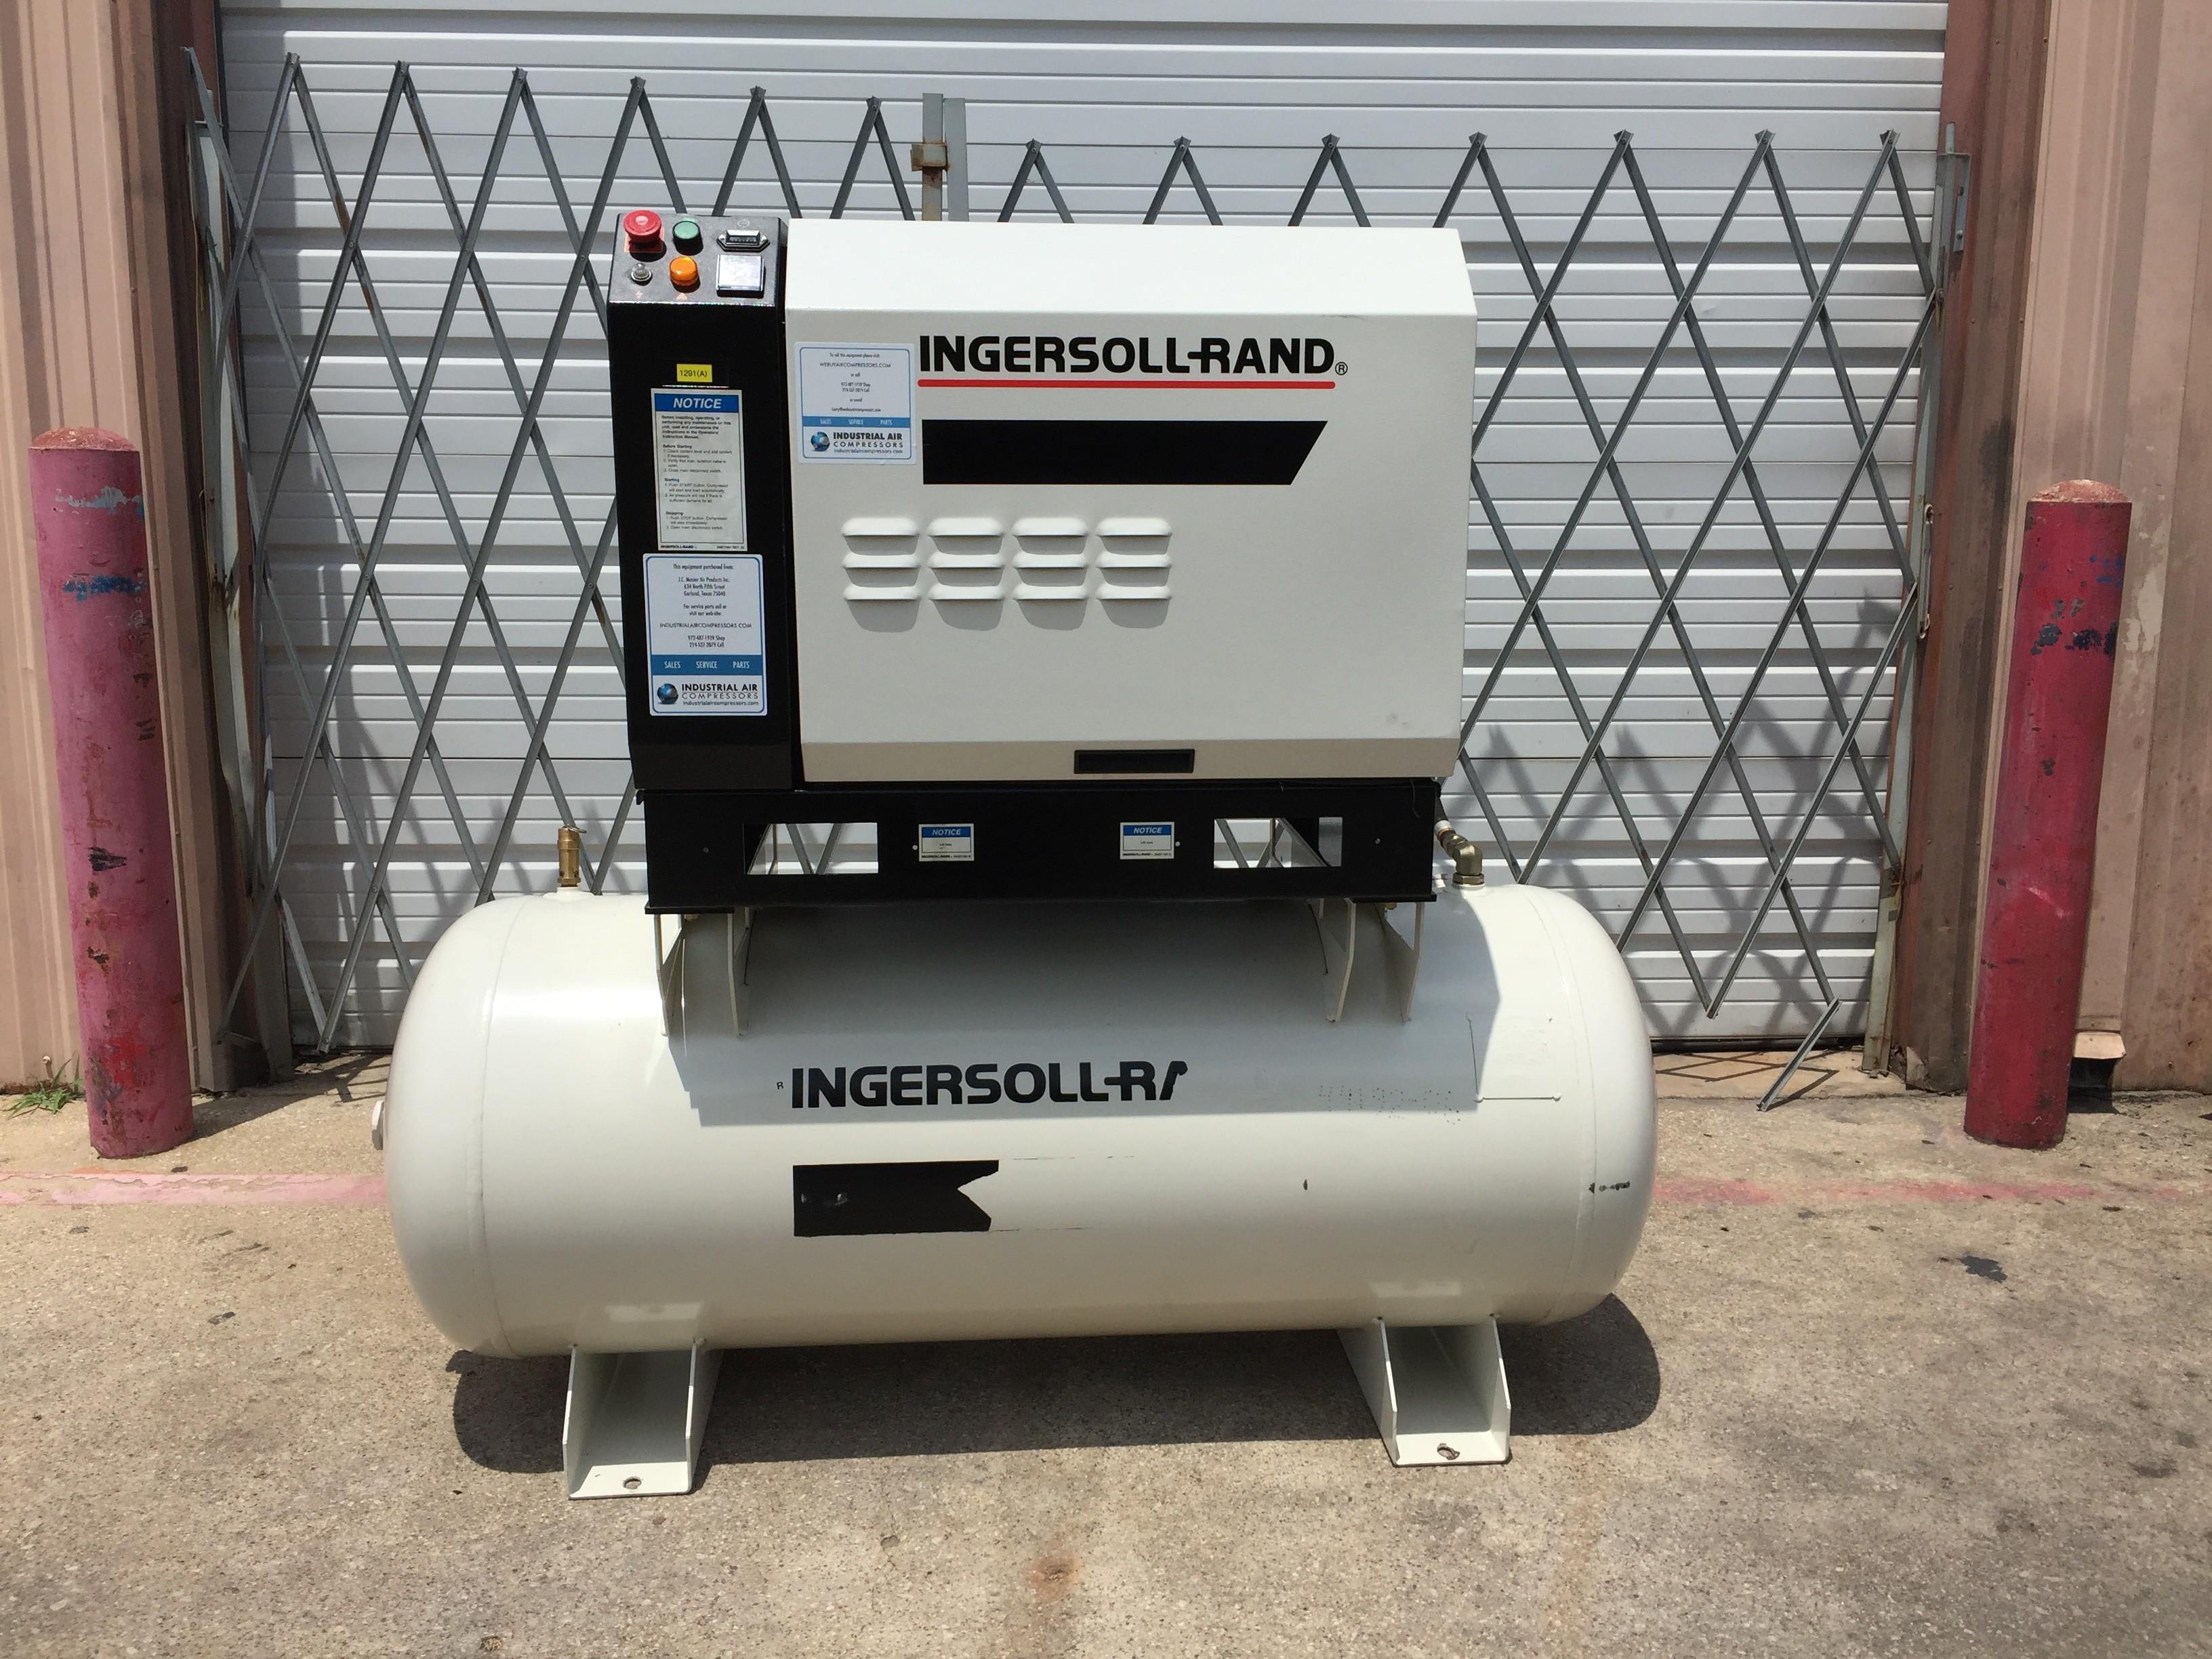 Ingersoll Rand 15 HP Screw Compressor Unit 1291(A)